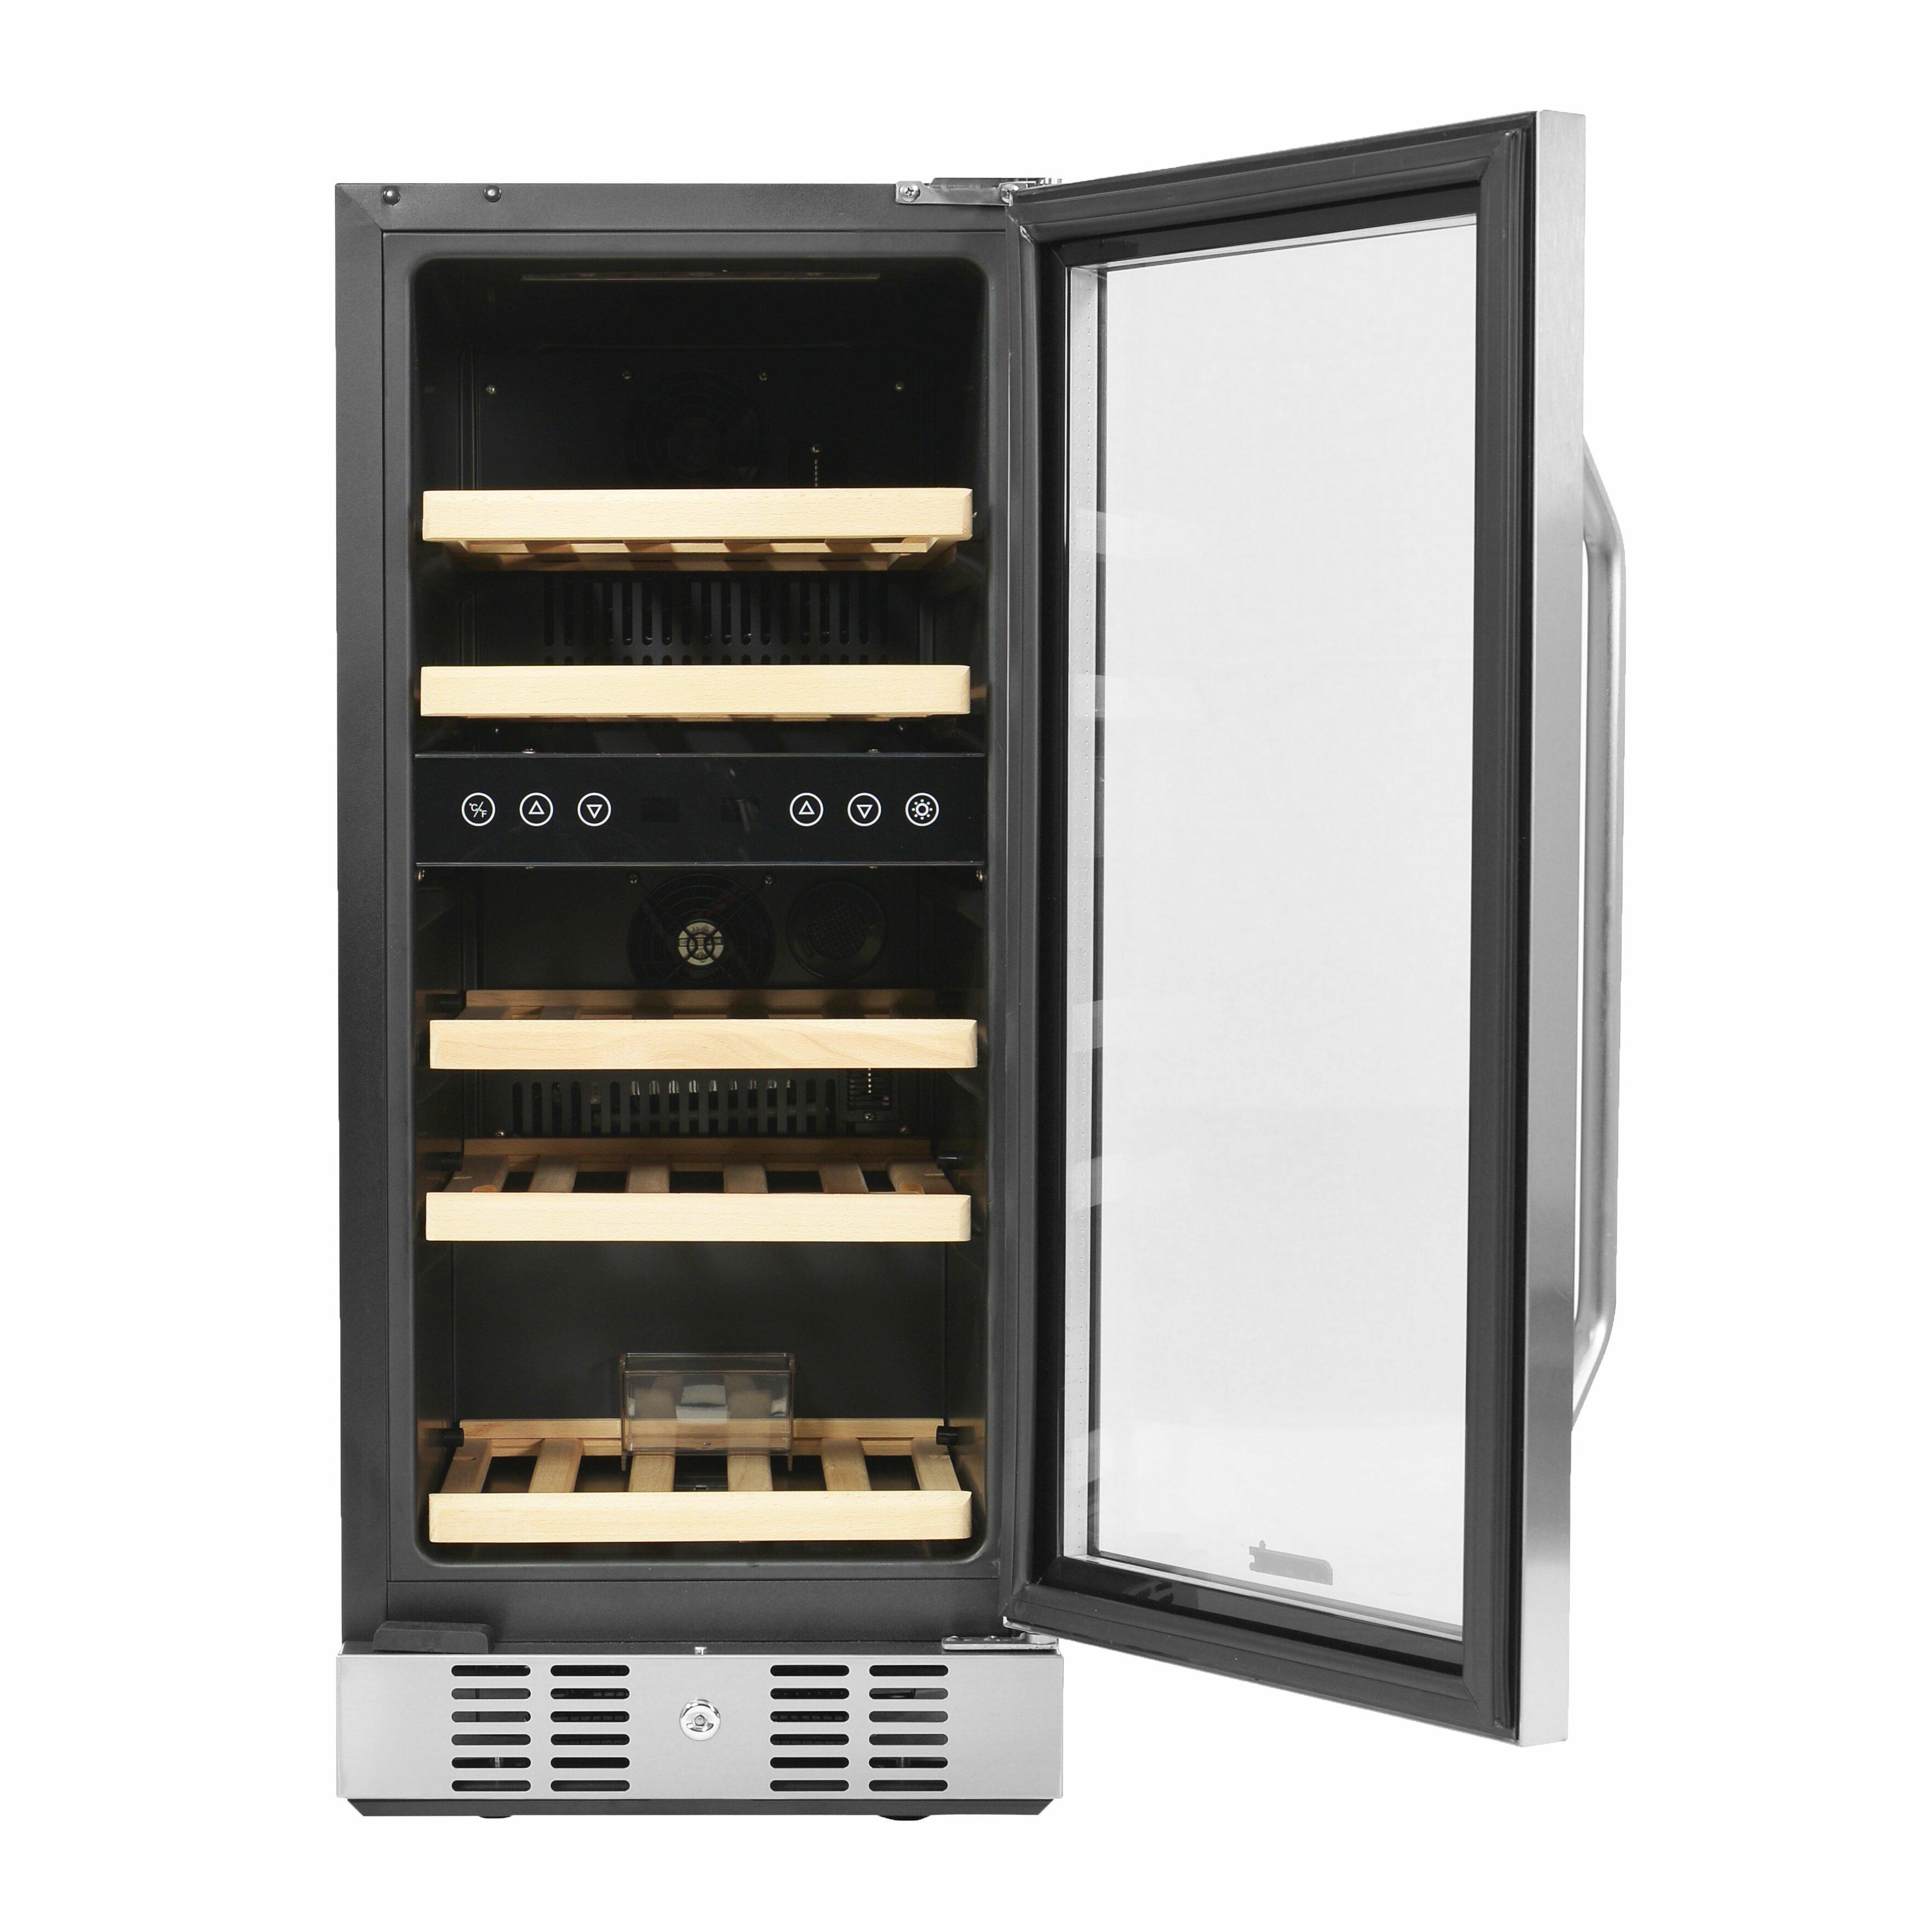 newair 29 bottle dual zone built in wine refrigerator reviews wayfair. Black Bedroom Furniture Sets. Home Design Ideas